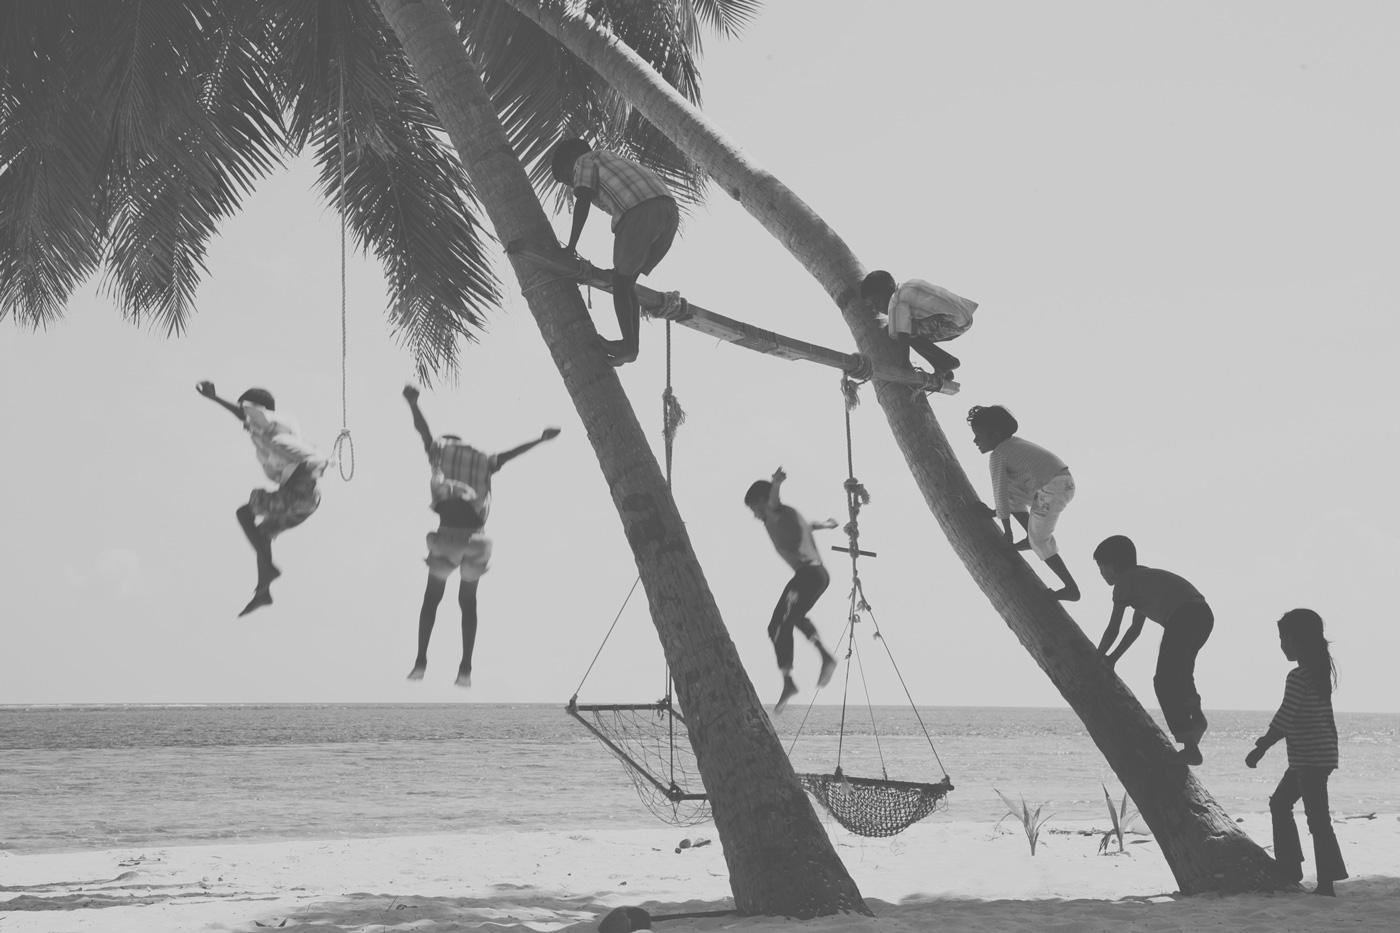 Kinder klettern auf Palme am Strand